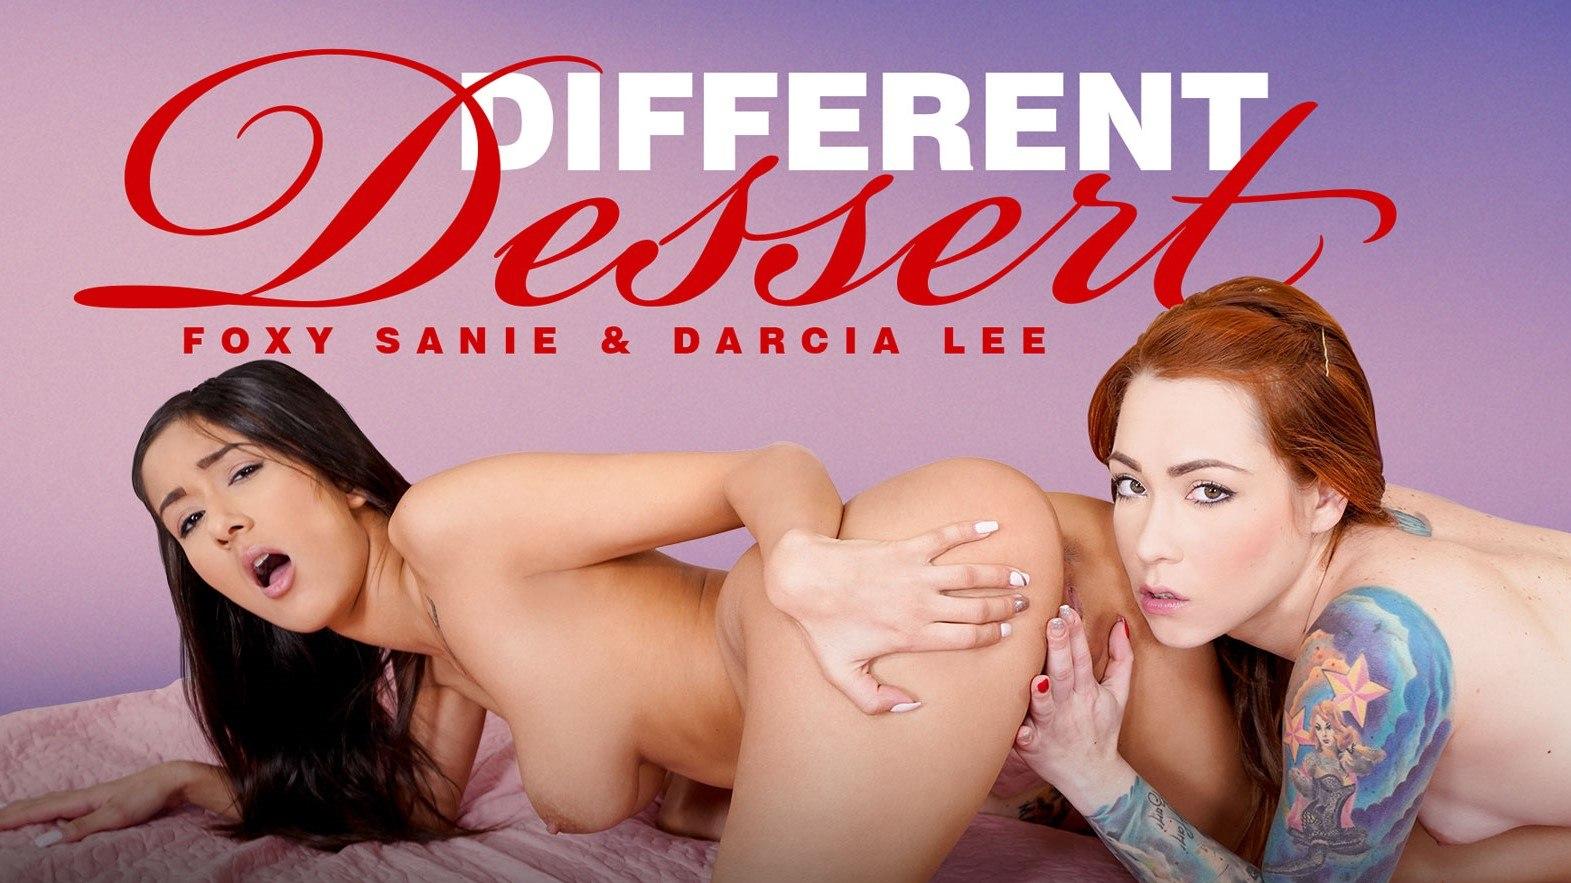 Different Dessert POV - Darcia Lee & Foxy Sanie VR Threesome